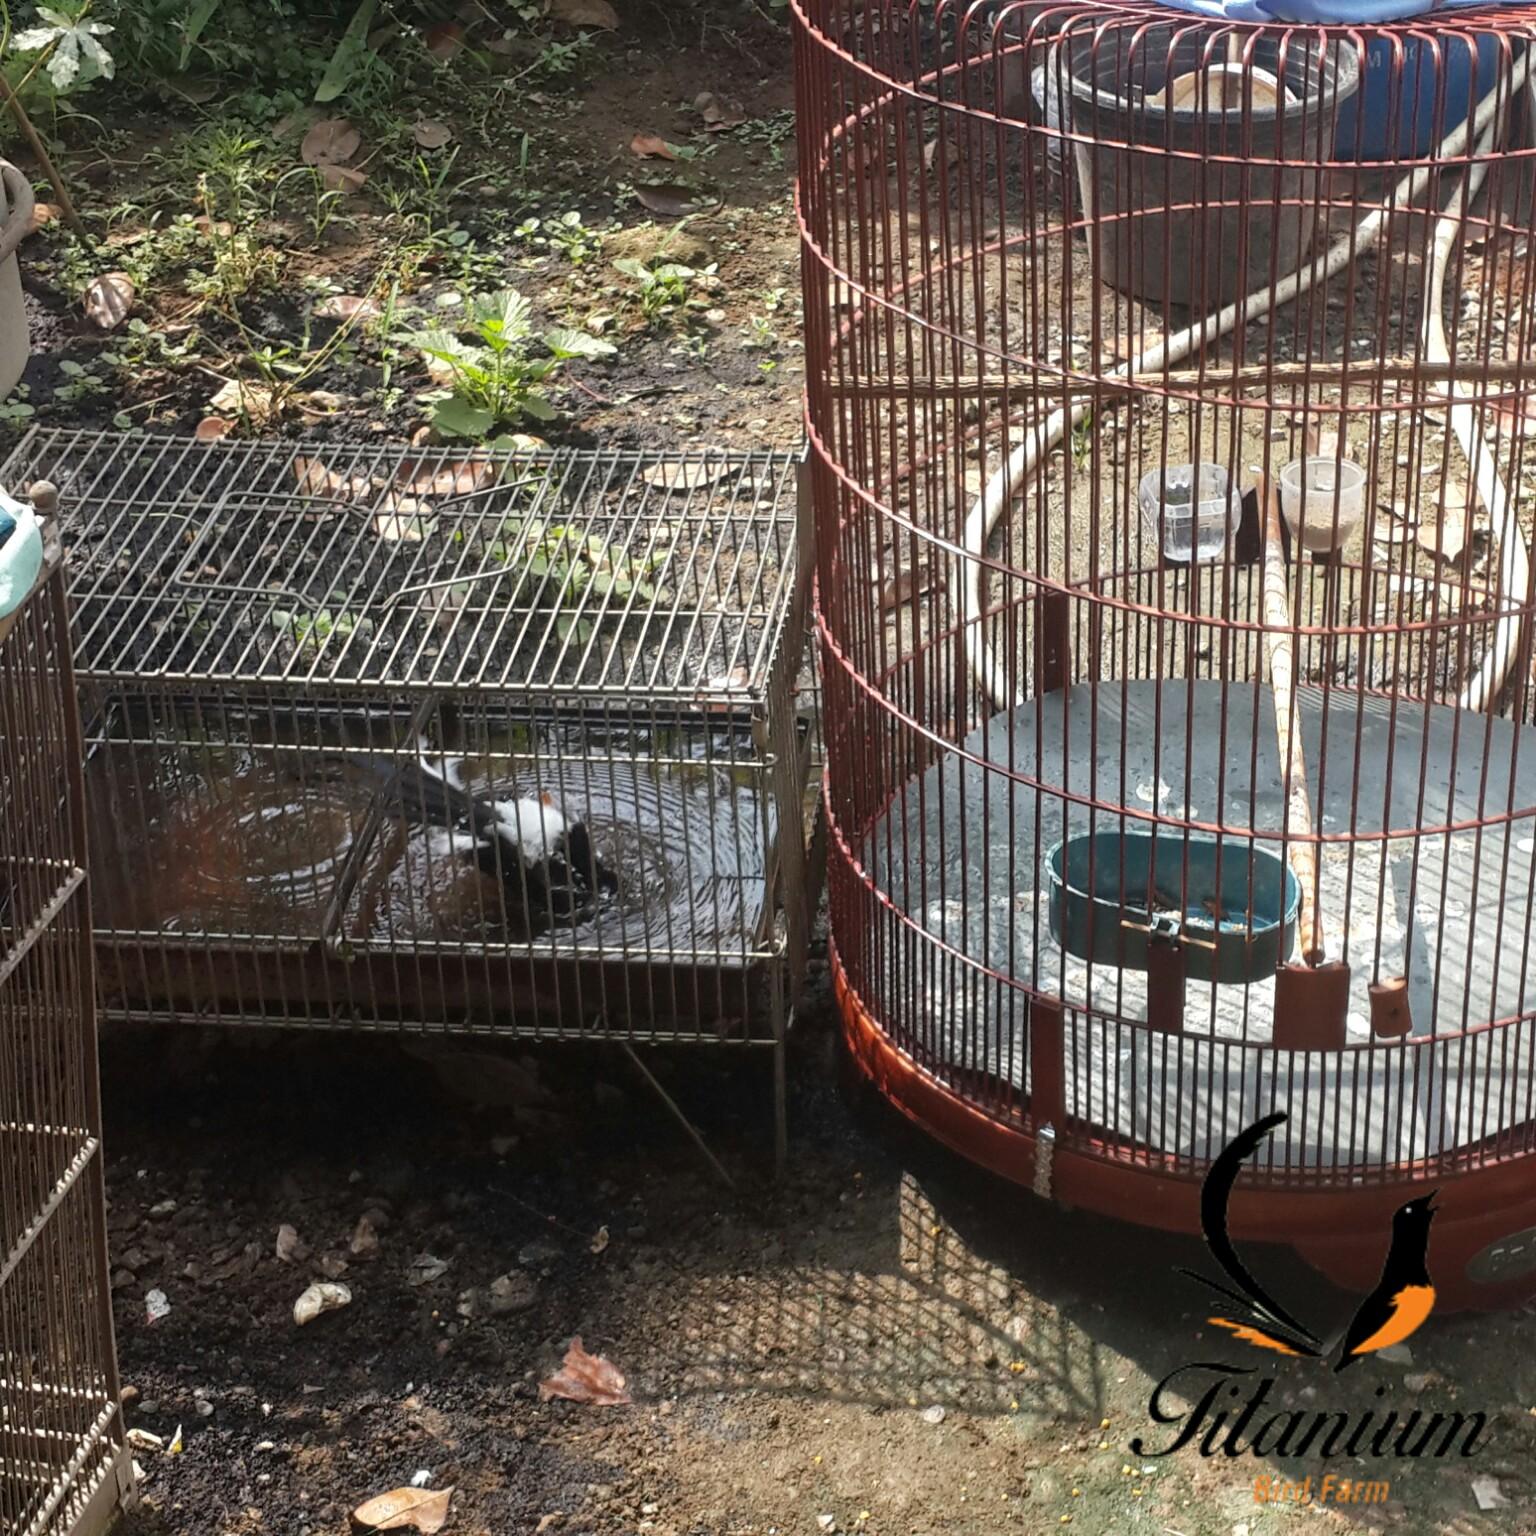 Beberapa Metode Mandi Untuk Mengoptimalkan Perawatan Murai Batu Titanium Bird Farm